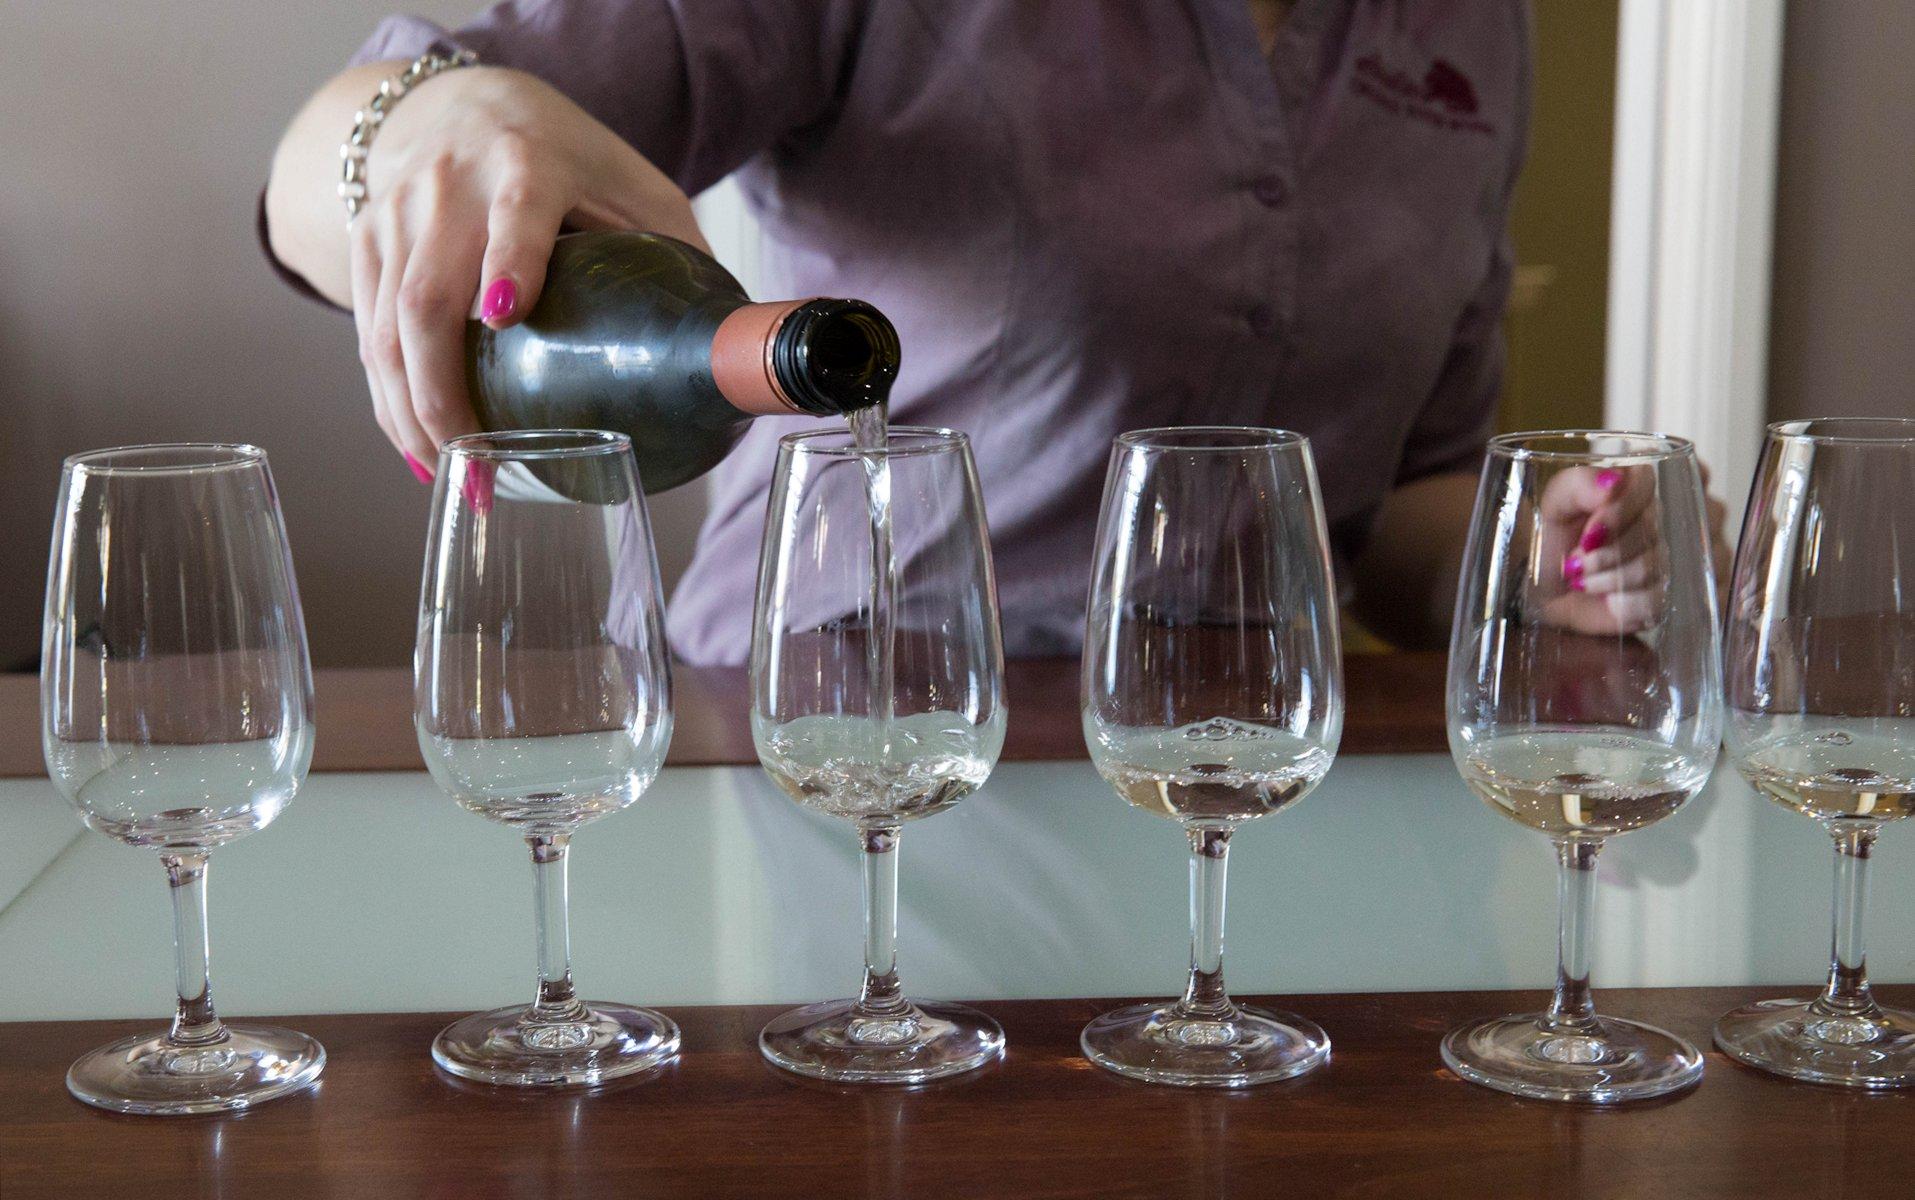 Wine tasting at Crooked River Winery, Kiama